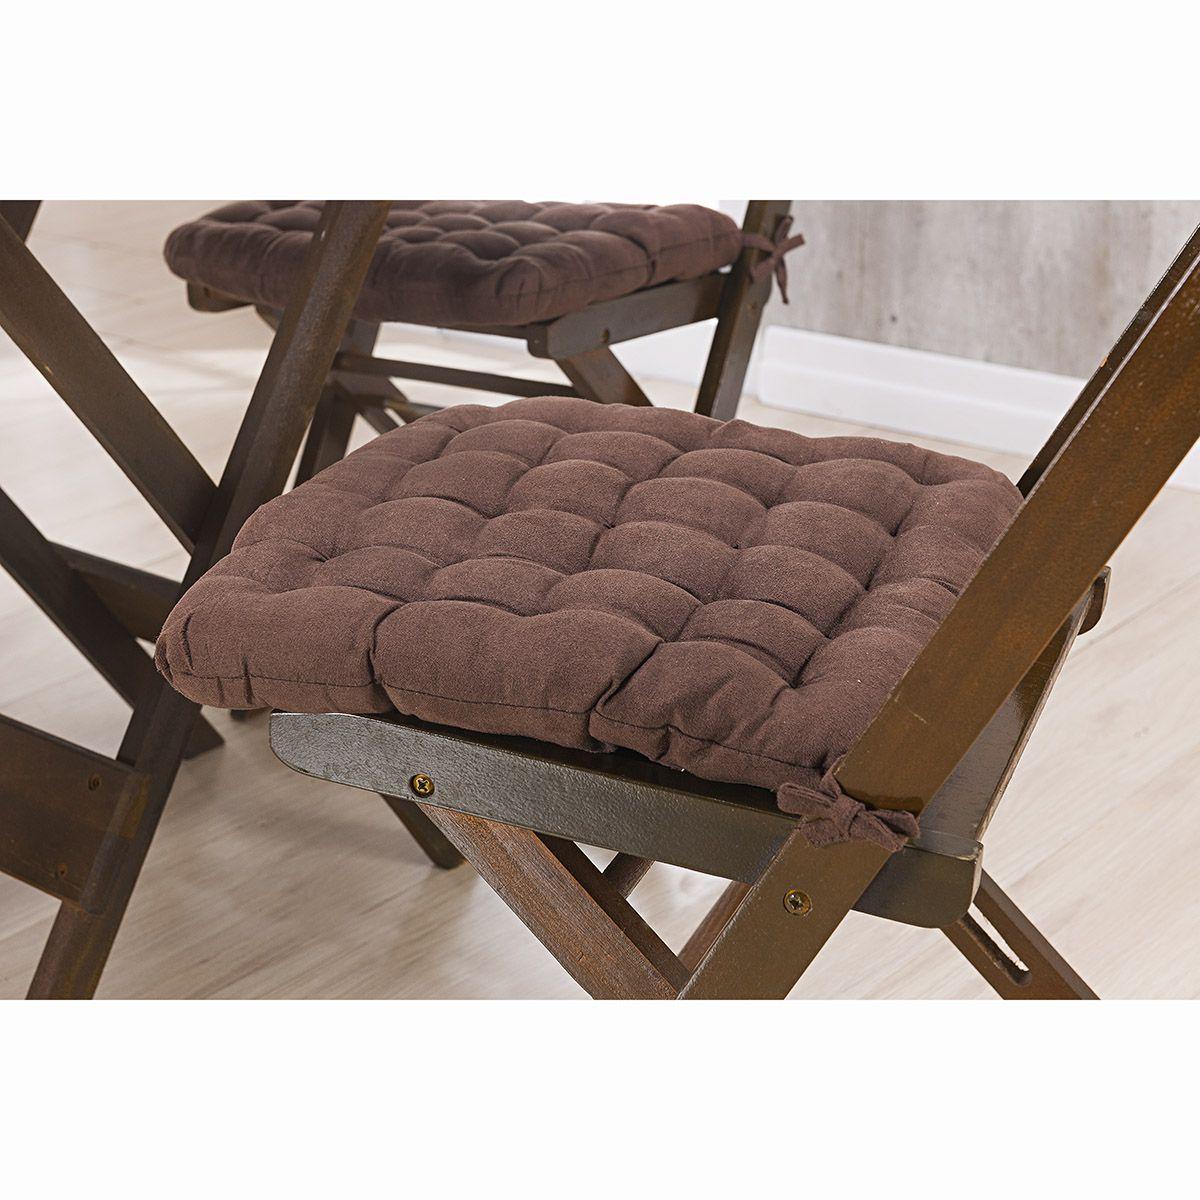 Assento P/ Cadeira - Futton - Kalamar - 40cm x 40cm - Chocolate - Niazitex